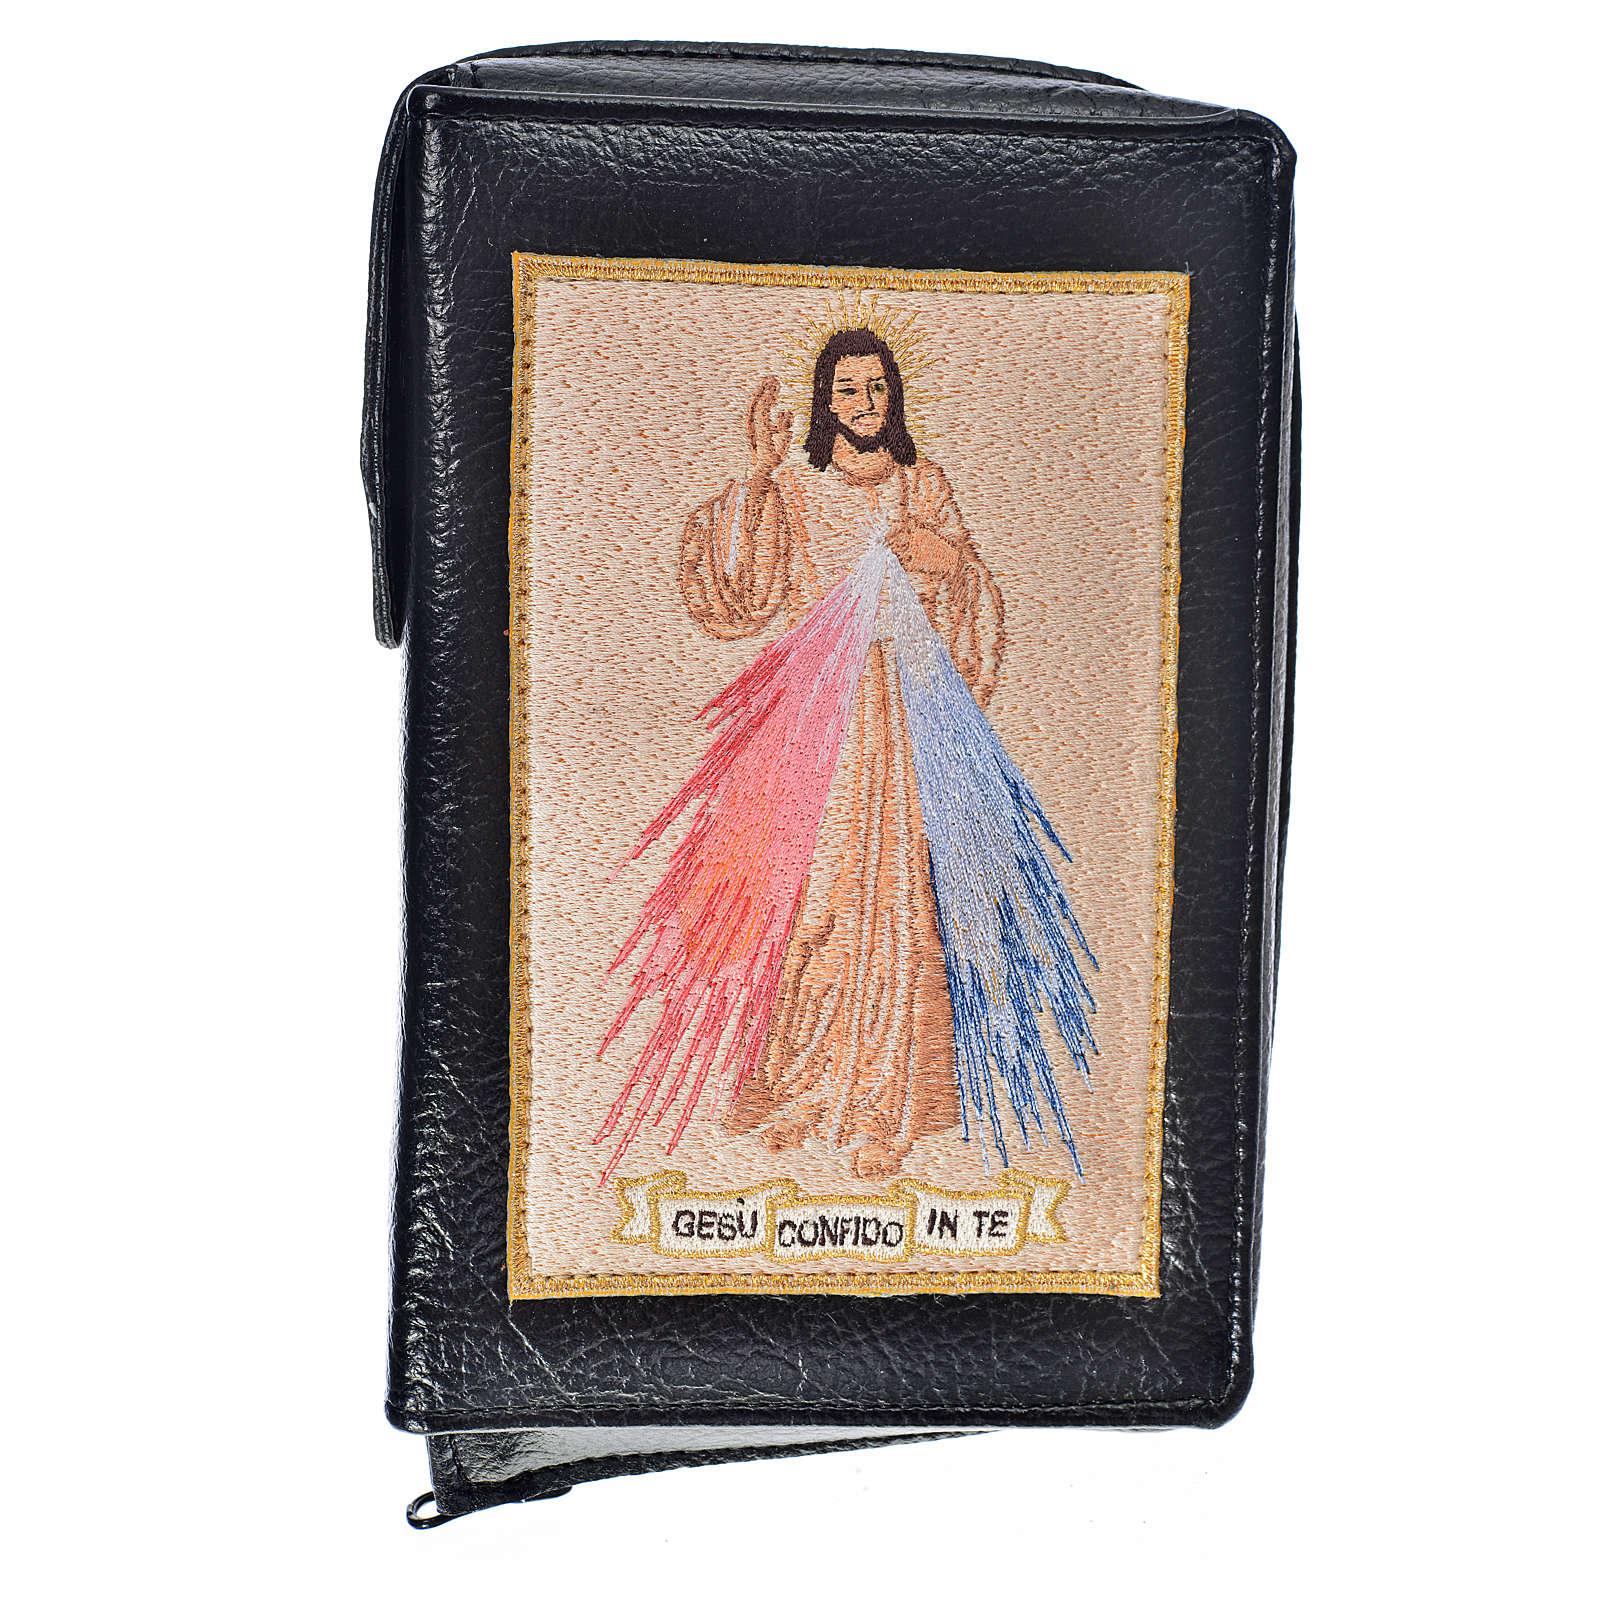 Funda Sagrada Biblia CEE ED. Pop. negro simil cuero Divina Miser 4